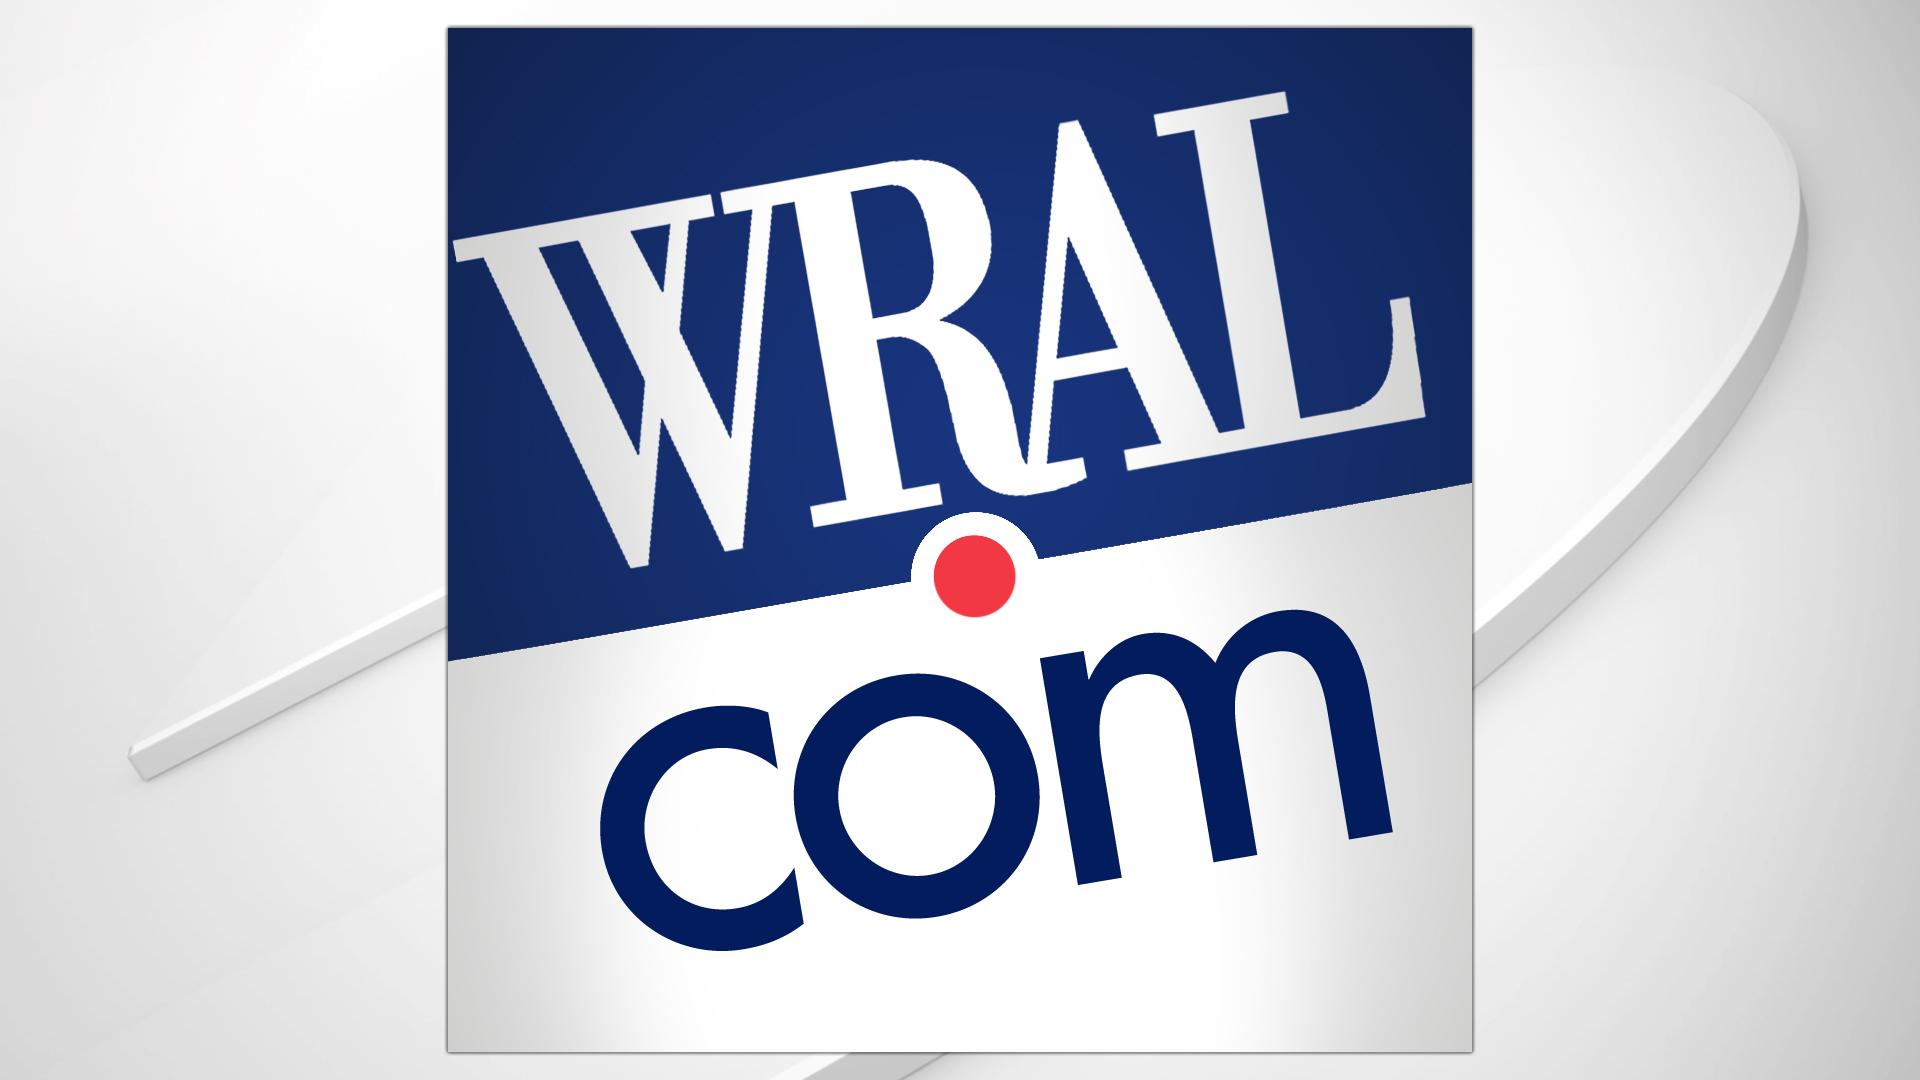 Elizabeth Warren demands investigation into elite investors accessing Trump briefings :: WRAL.com